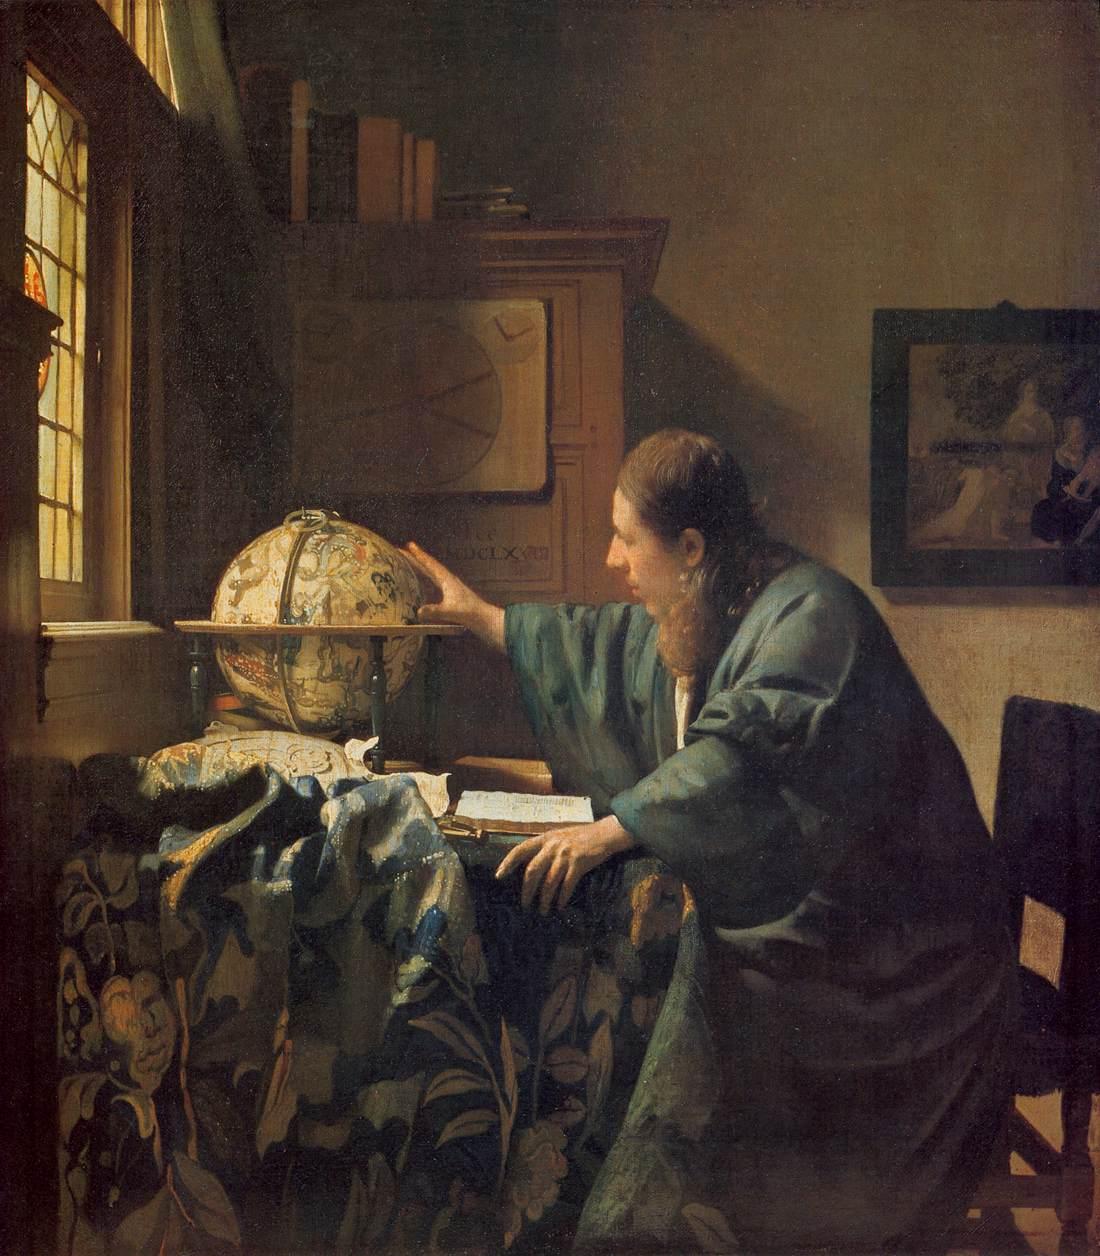 3 Johannes_Vermeer_-_The_Astronomer_-_WGA24685.jpg